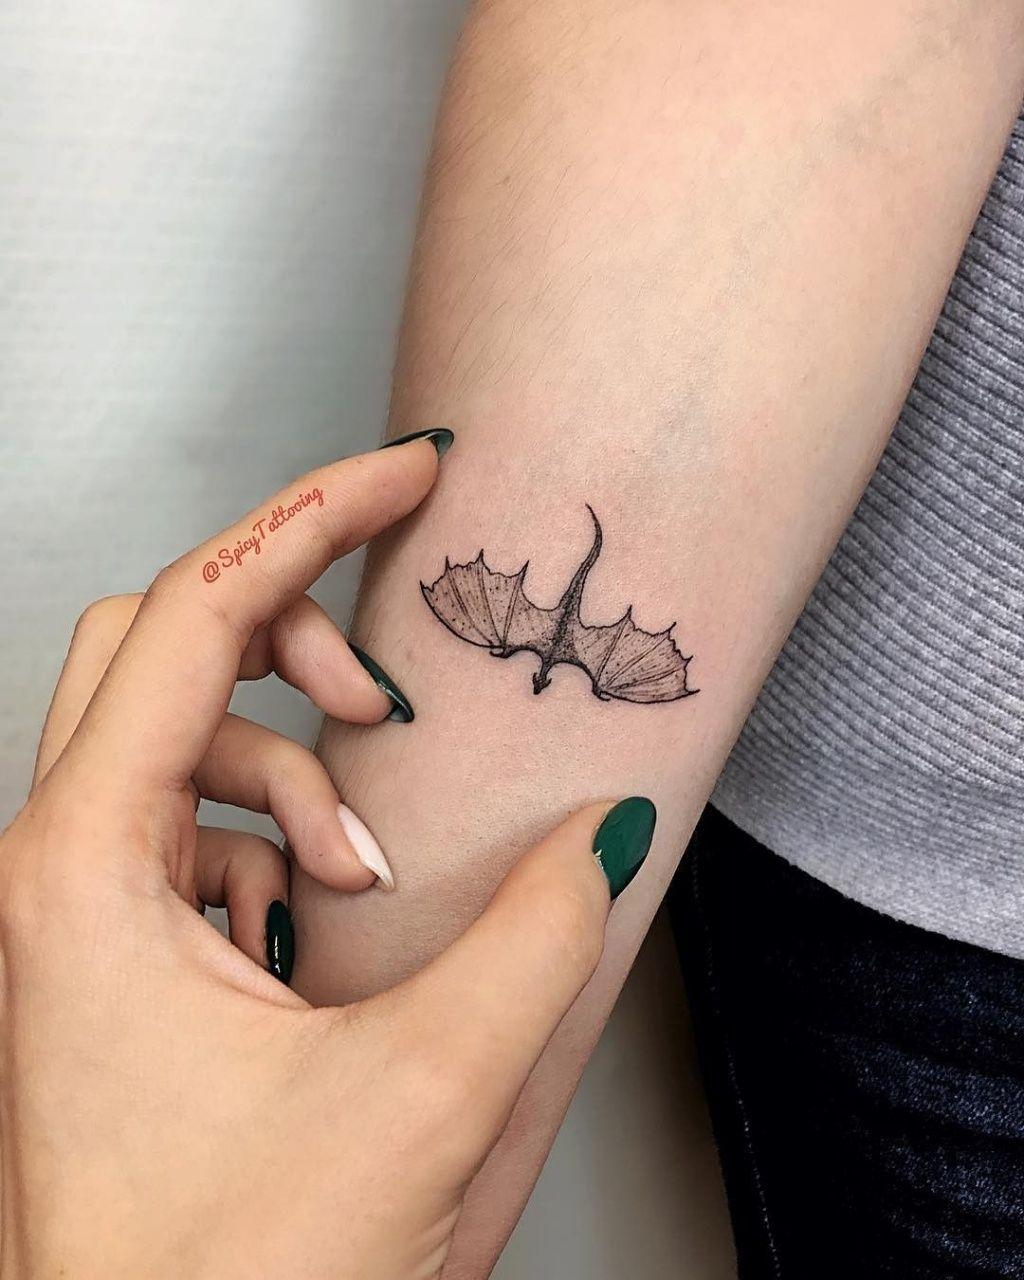 Dragon Tattoos Tumblr : dragon, tattoos, tumblr, Tattoos, Girls, Tumblr, Tattoo, Designs, Girls,, Tattoos,, Latest